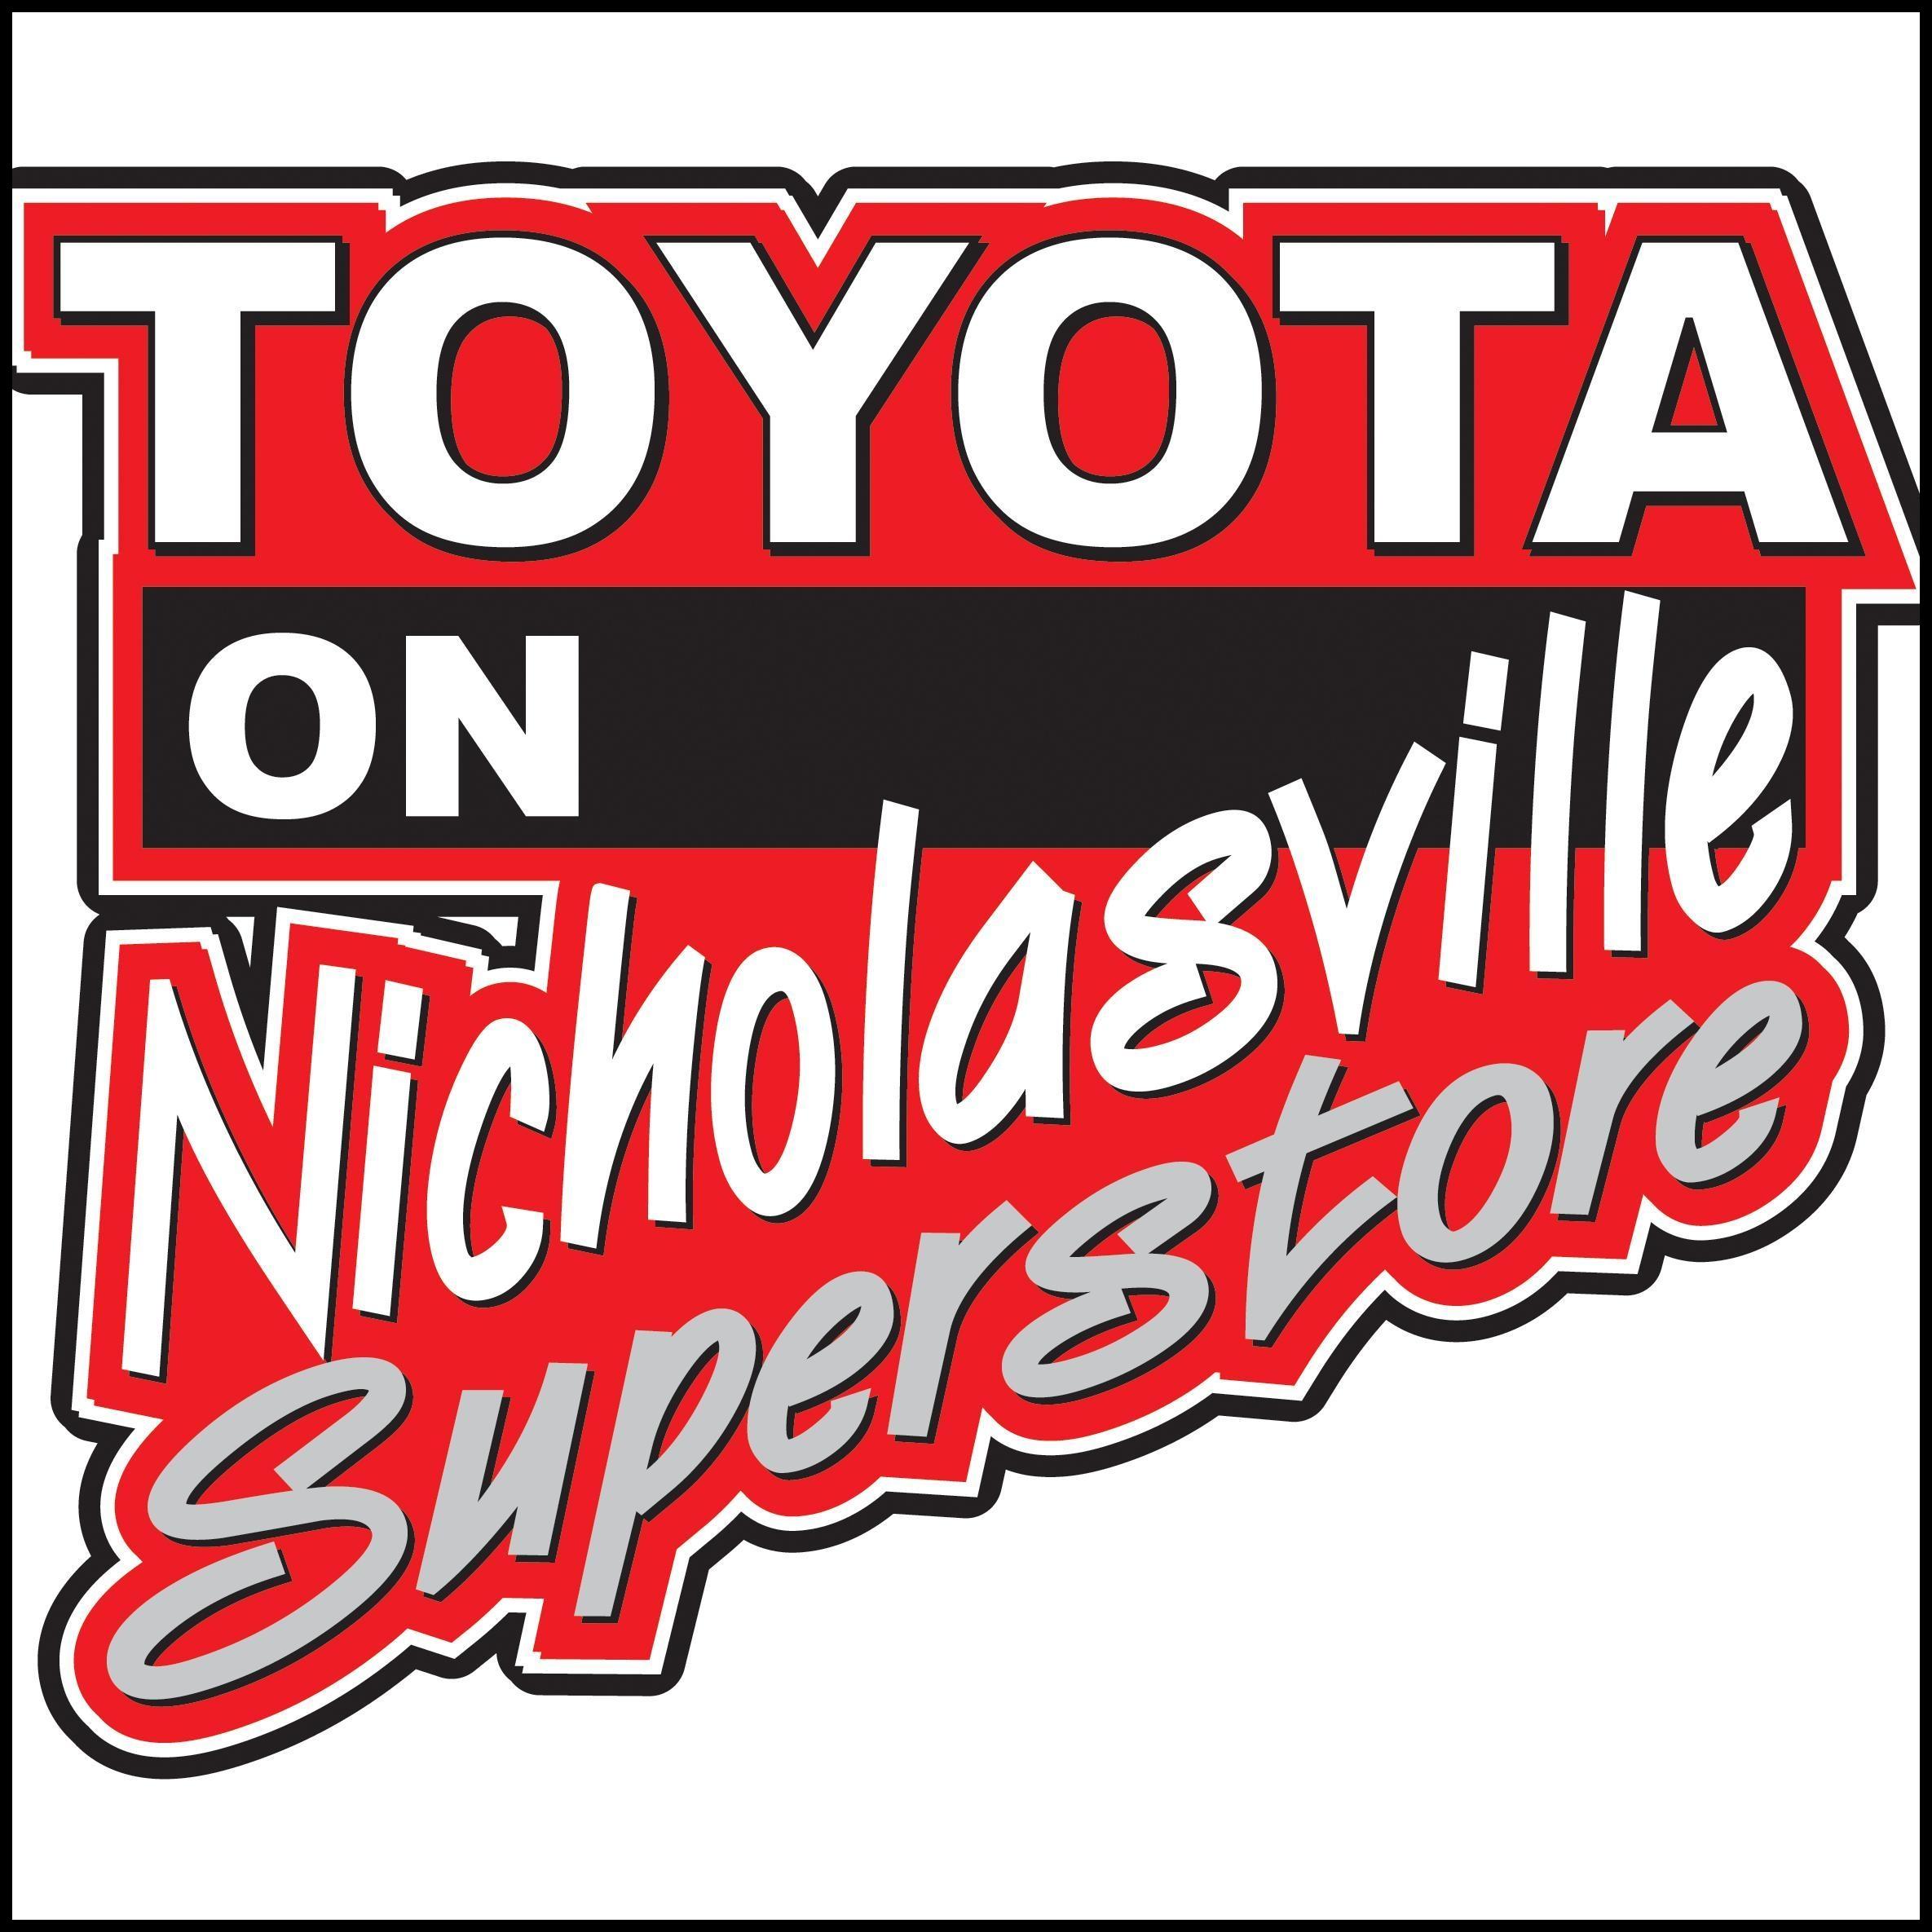 Toyota Nicholasville